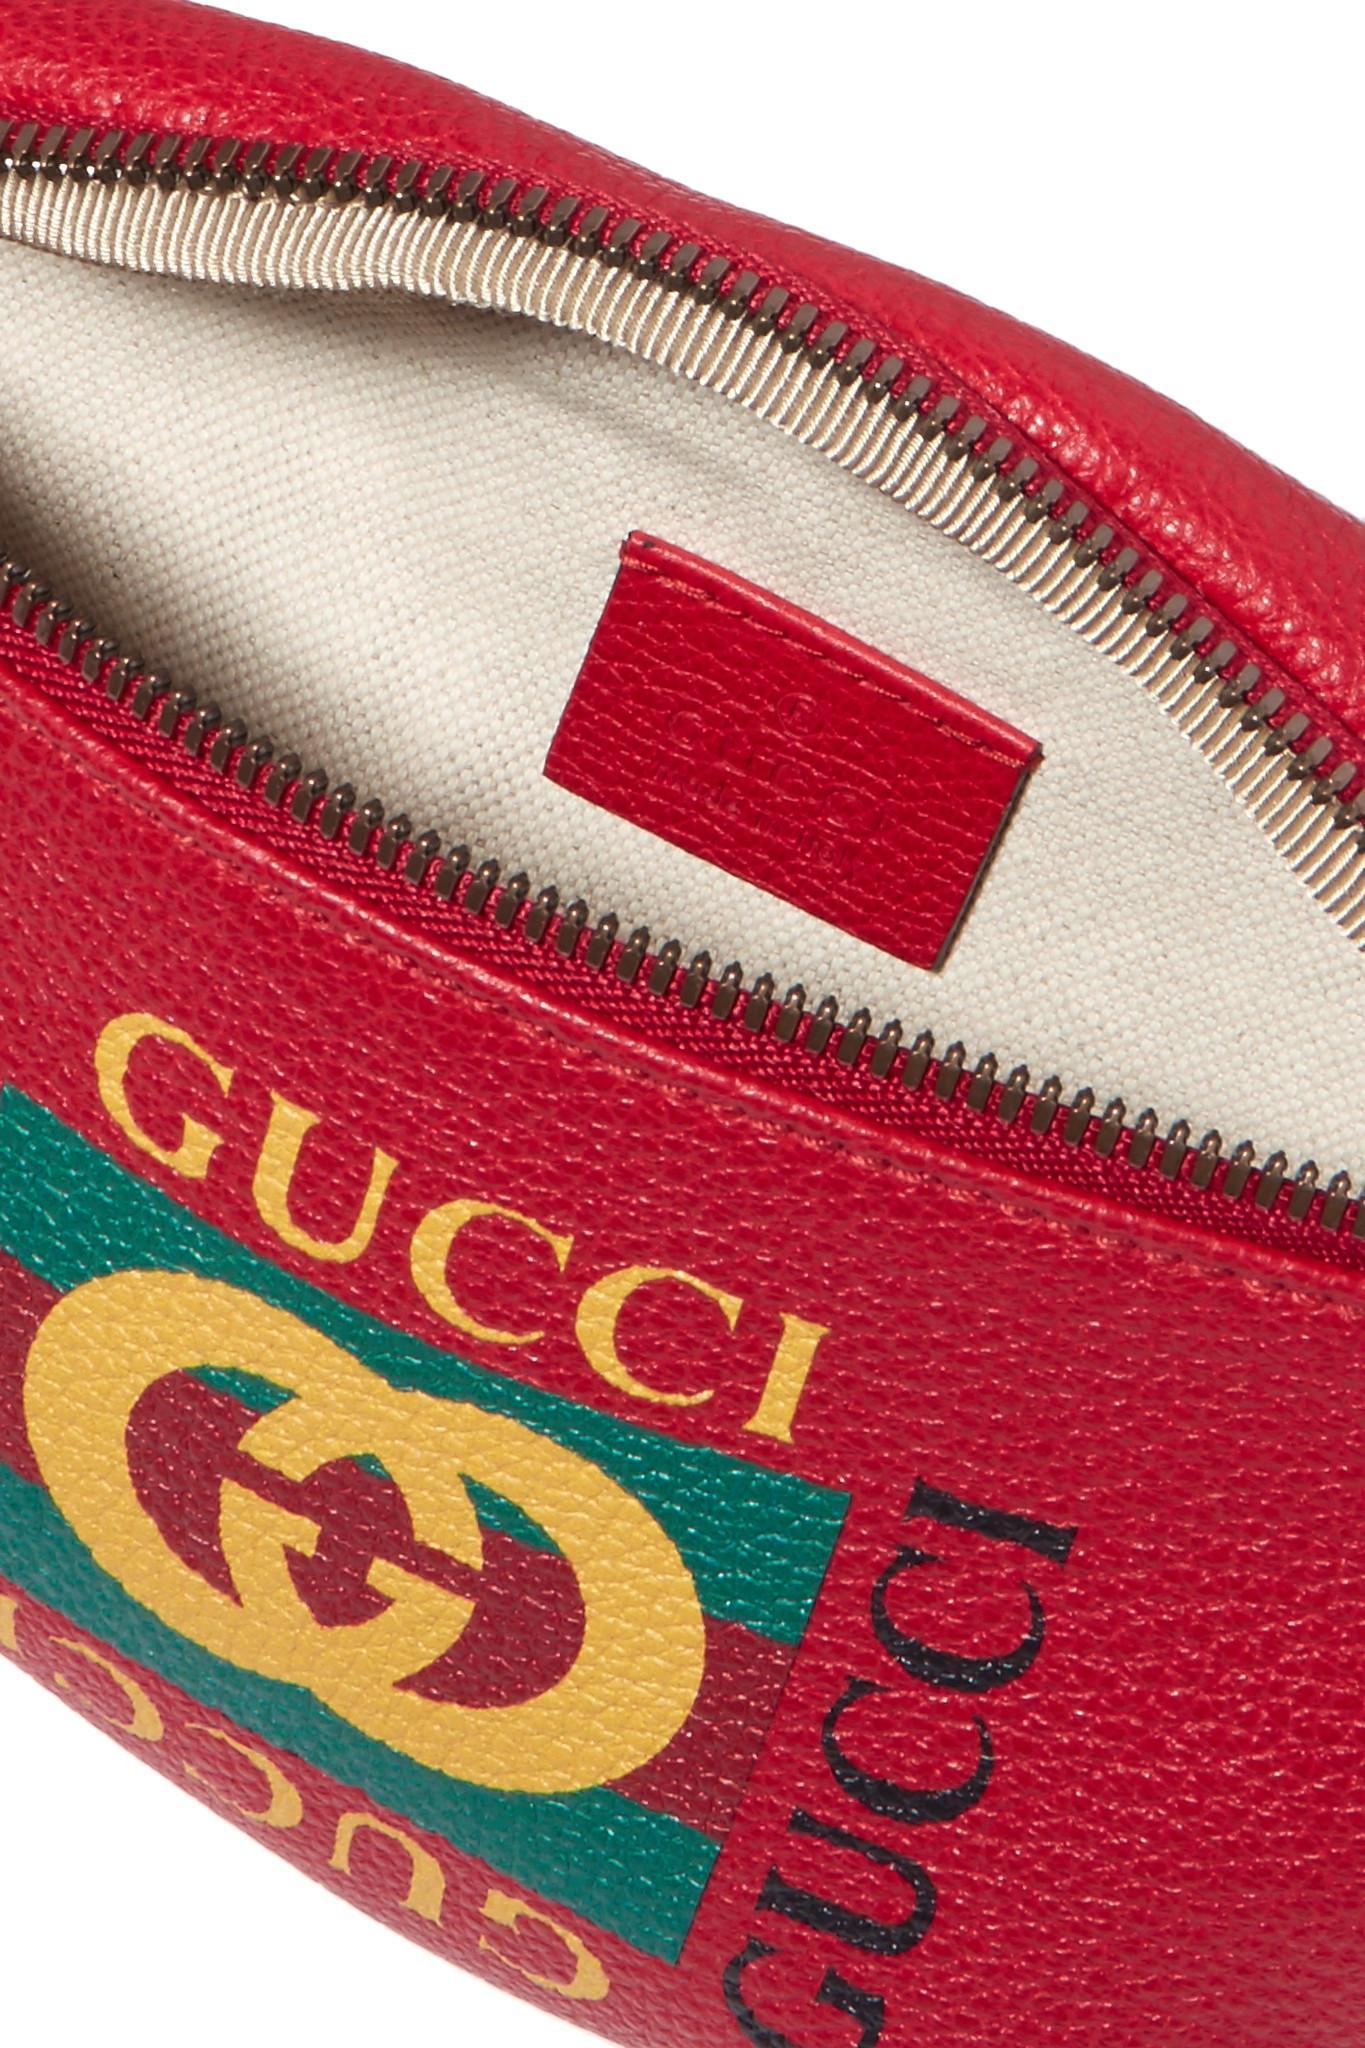 21981803a6b Gucci - Printed Textured-leather Belt Bag - Lyst. View fullscreen